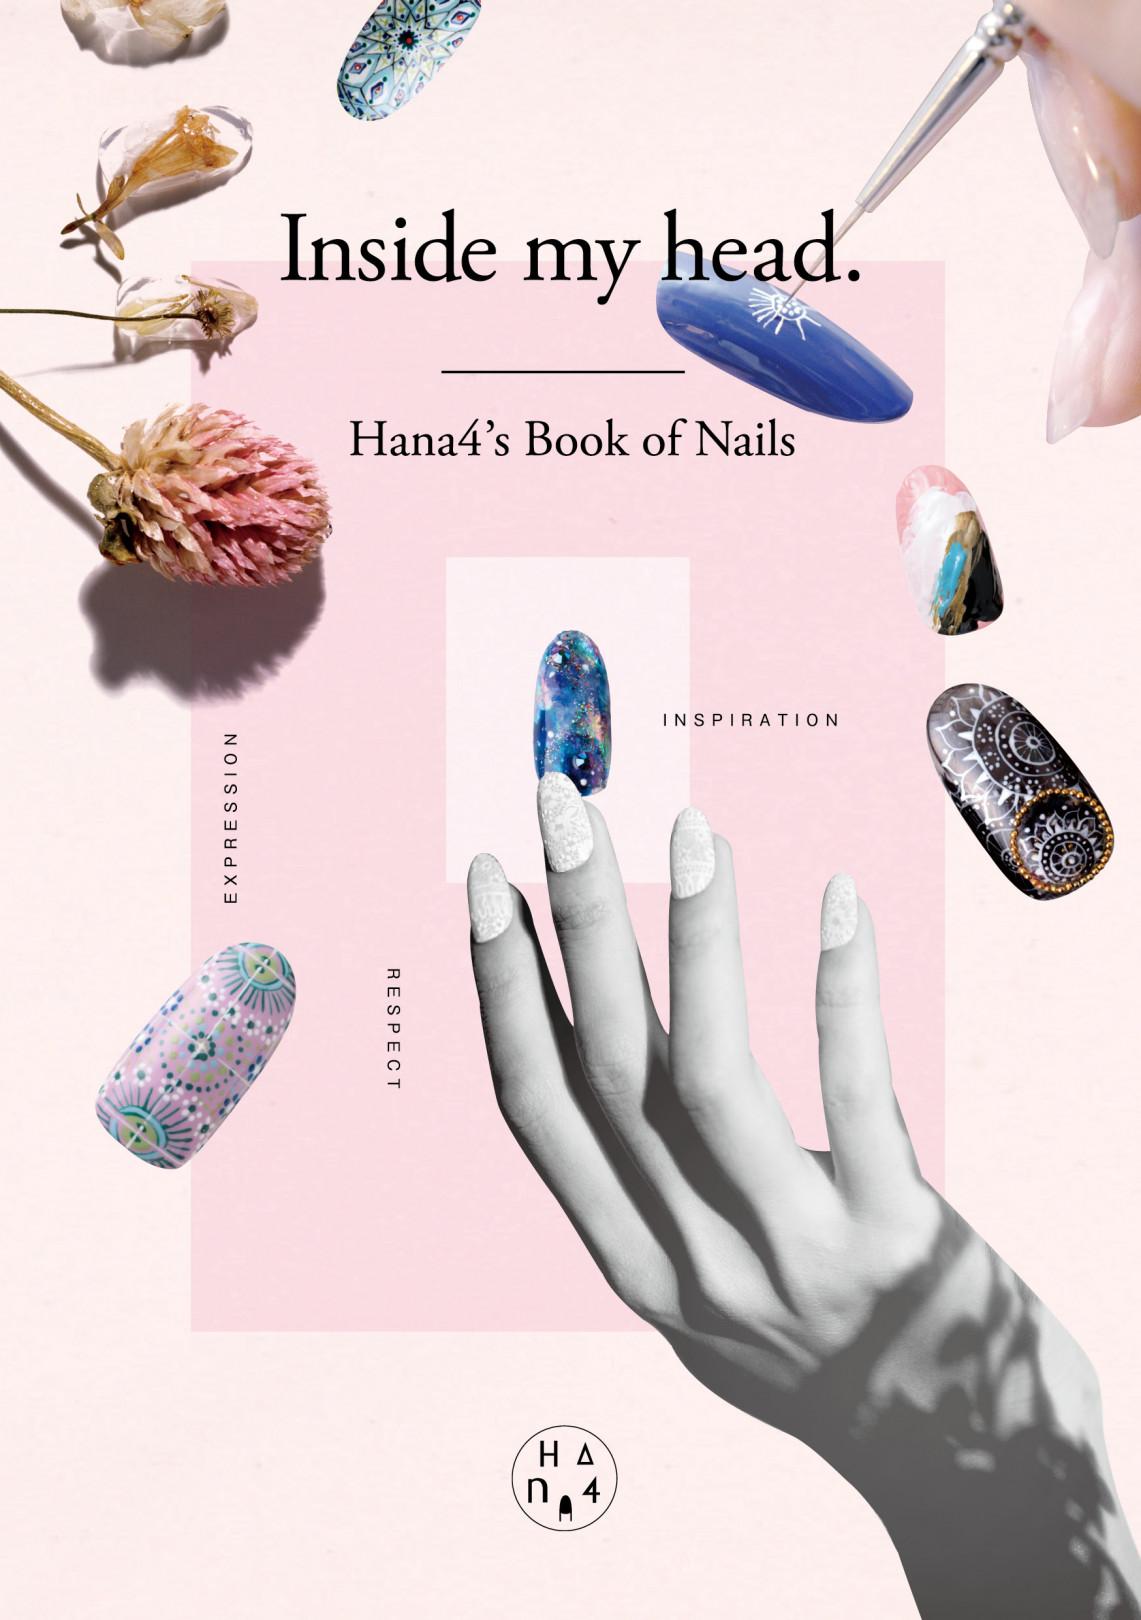 『Inside my head.-Hana4' s Book of Nails』